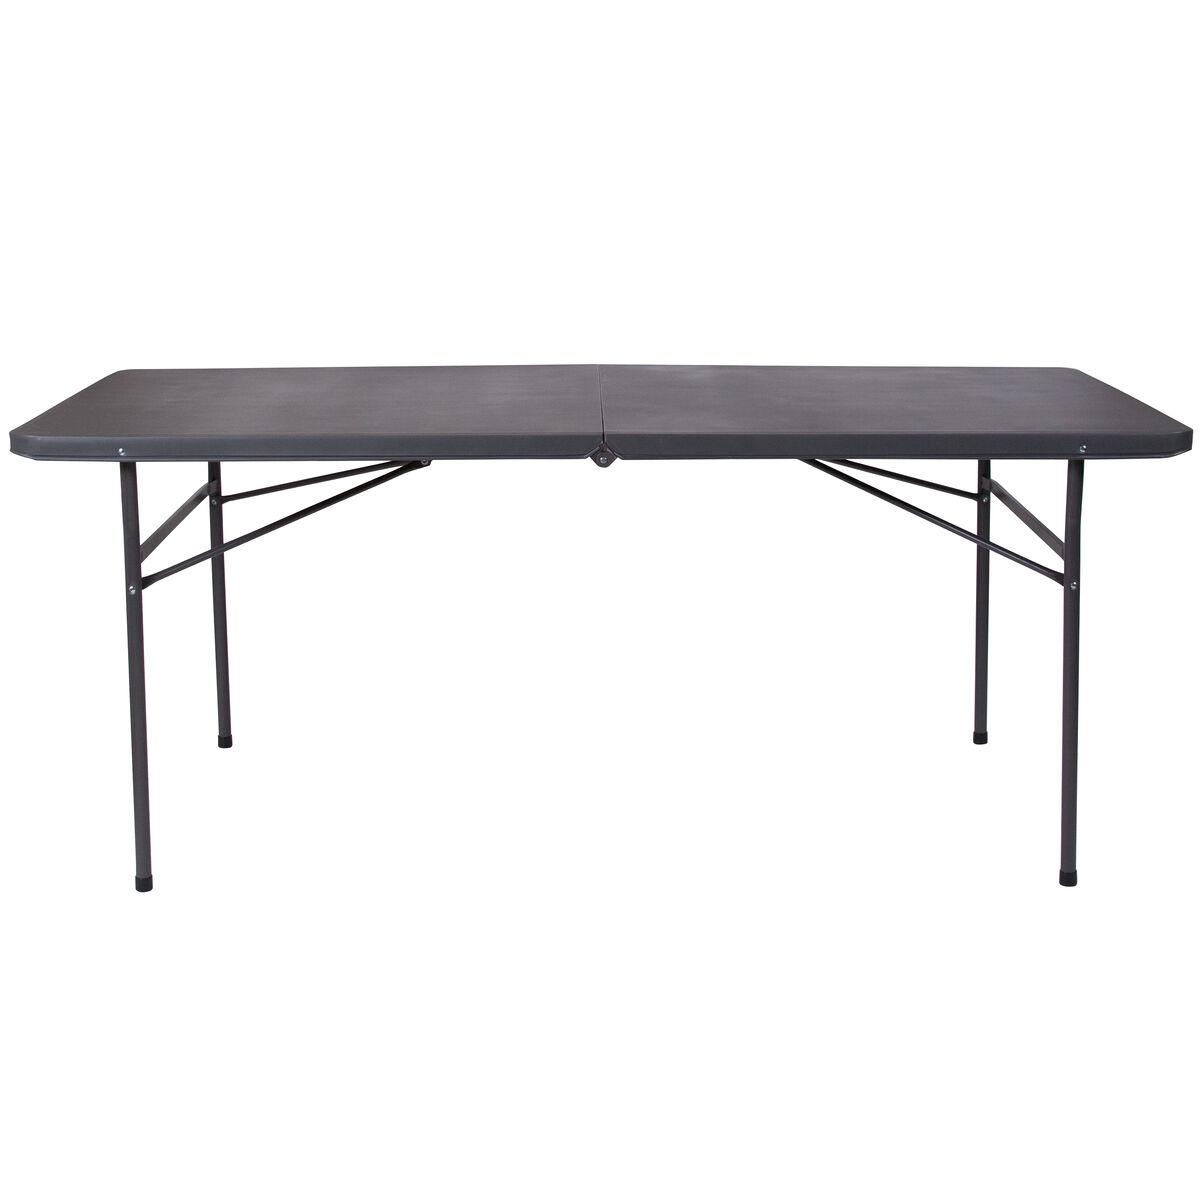 30x72 gray plastic fold table dad lf 183z dg gg bestchiavarichairs com